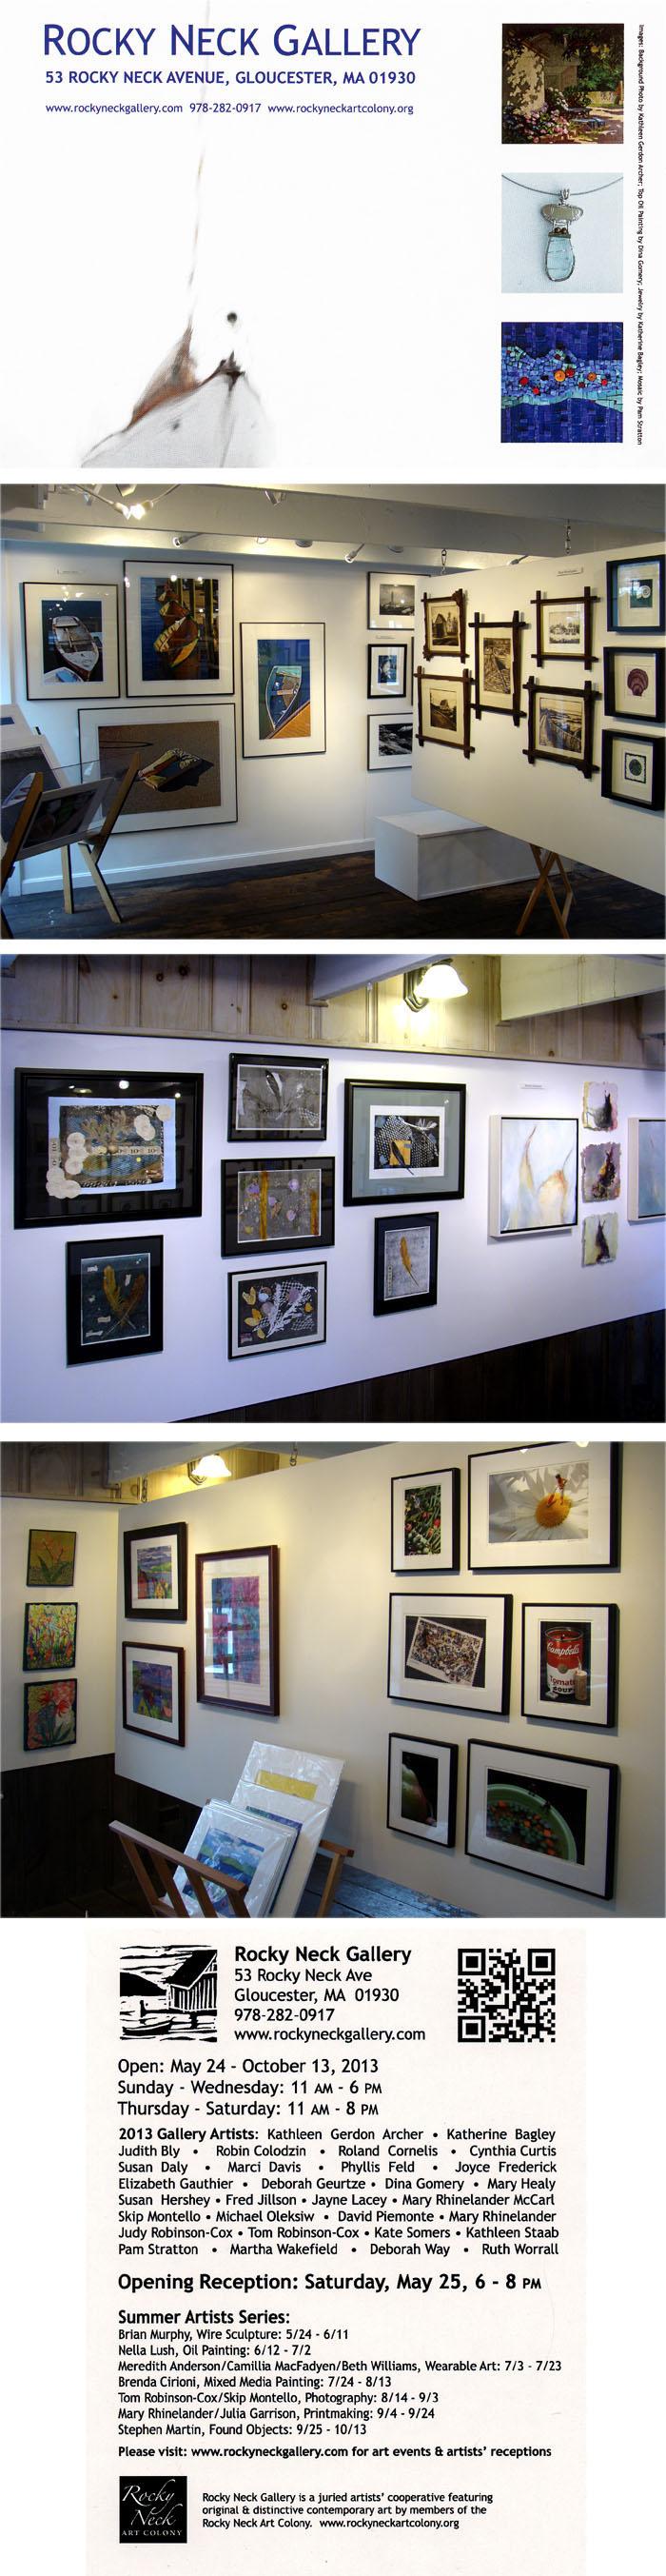 rocky neck gallery opening 2013